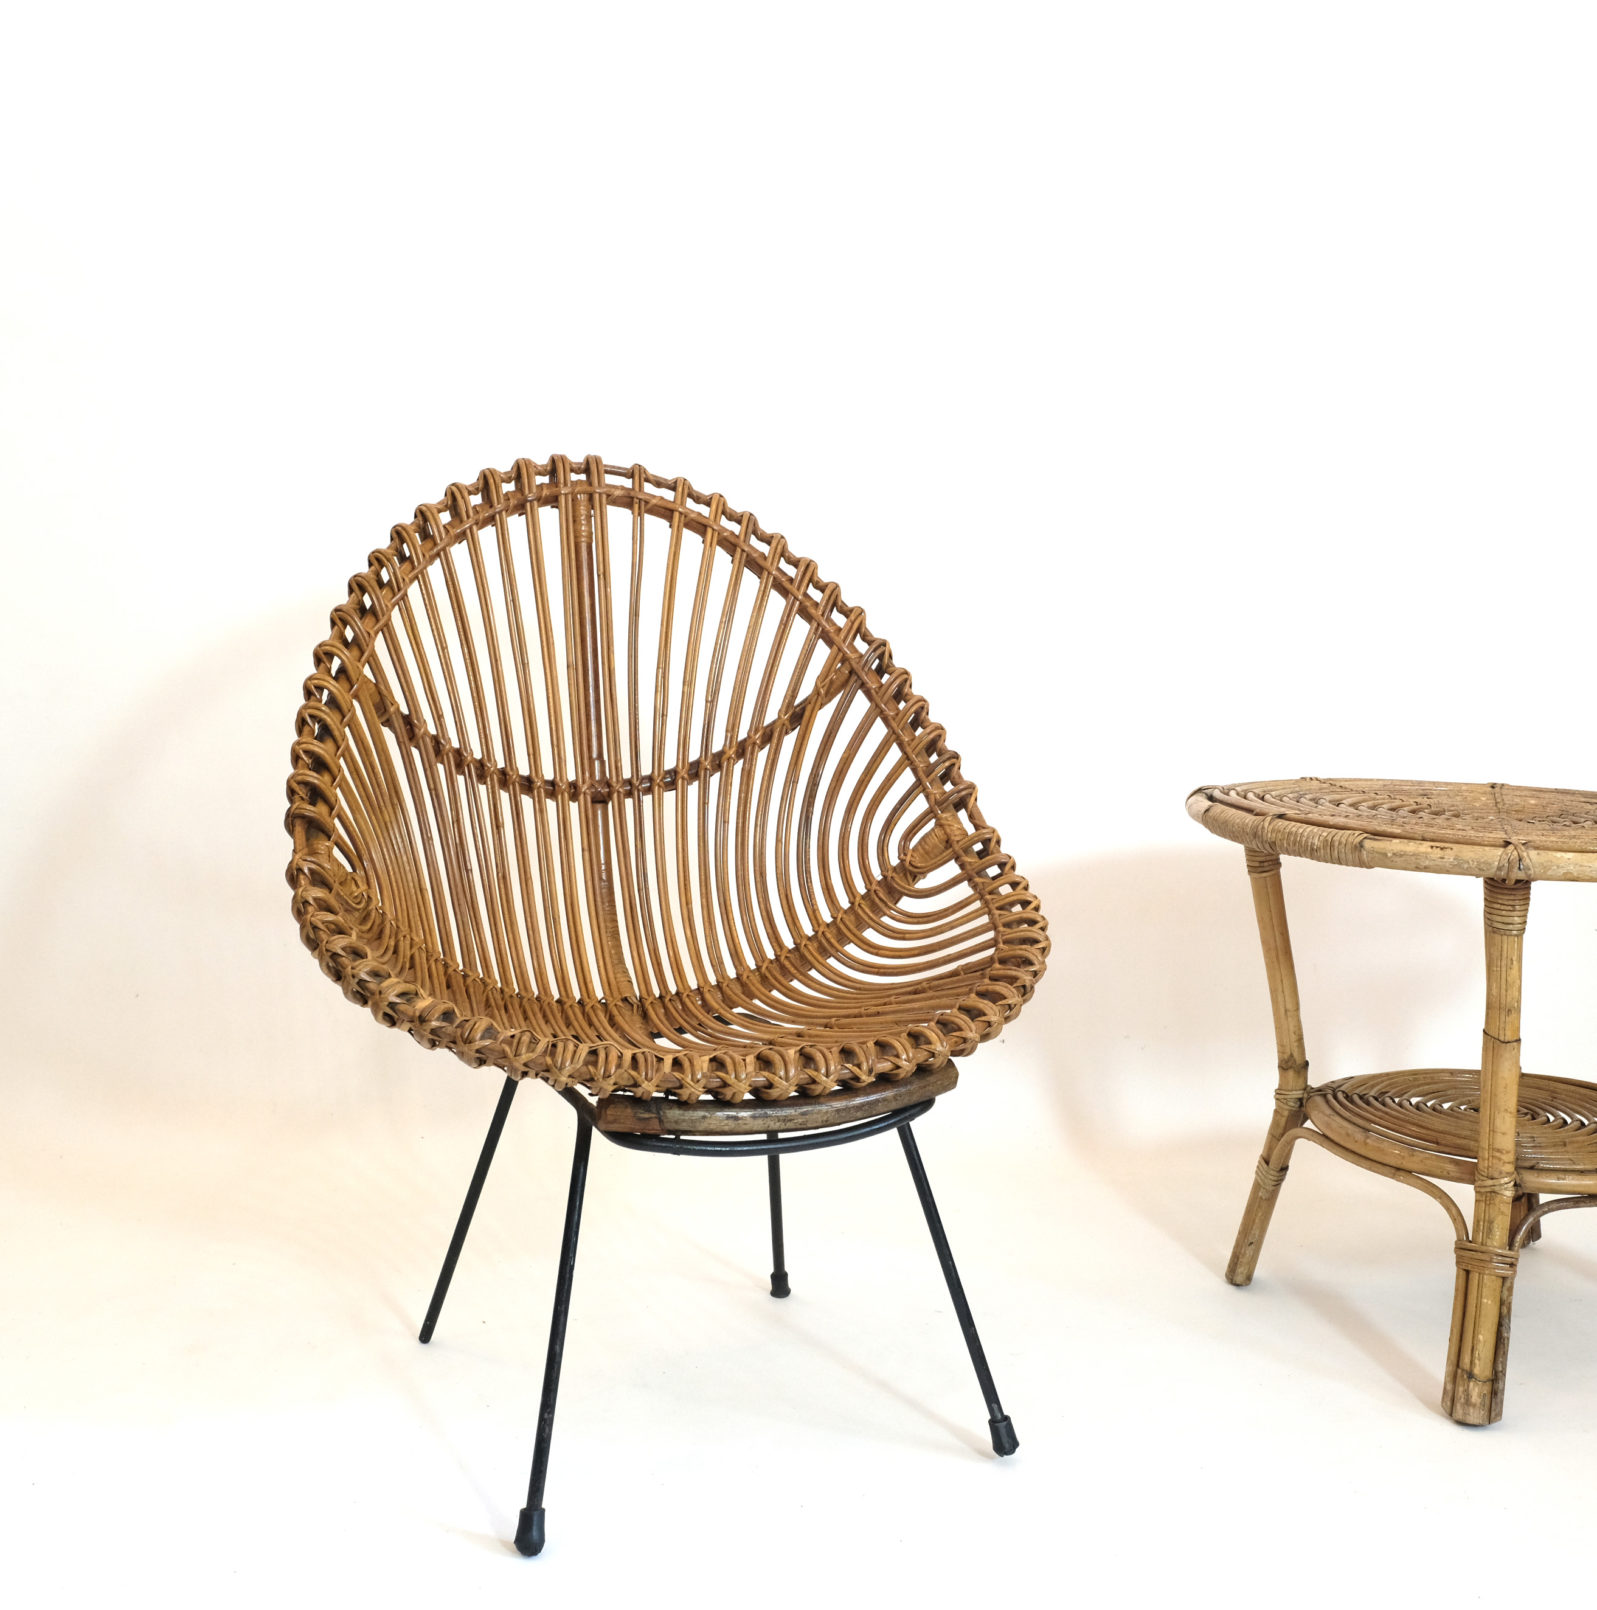 Italian rattan lounge chair from the sixties, n°1.